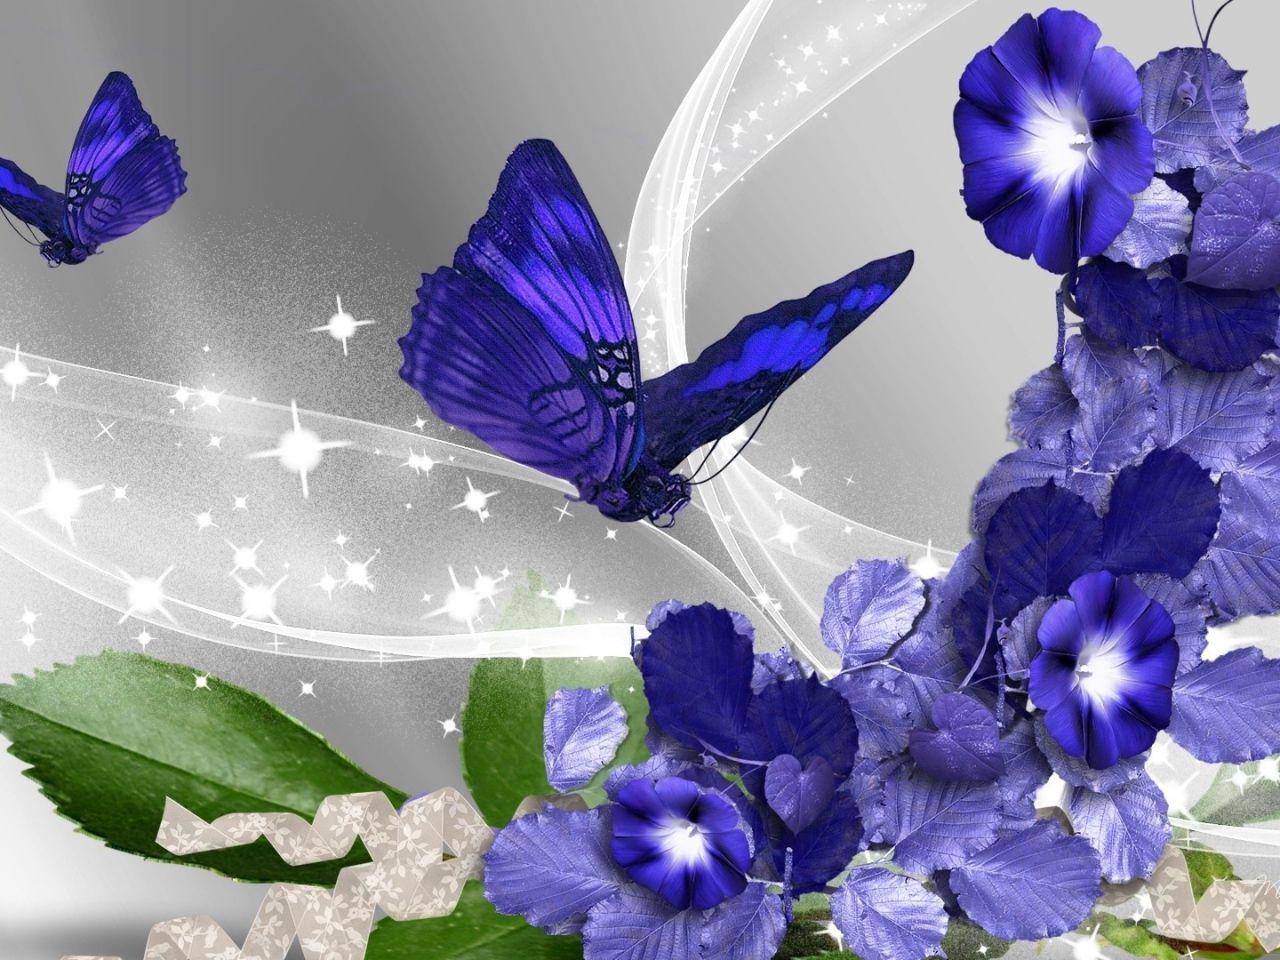 Flores mariposas im genes fondos de pantalla fondos for Fondos para pc gratis